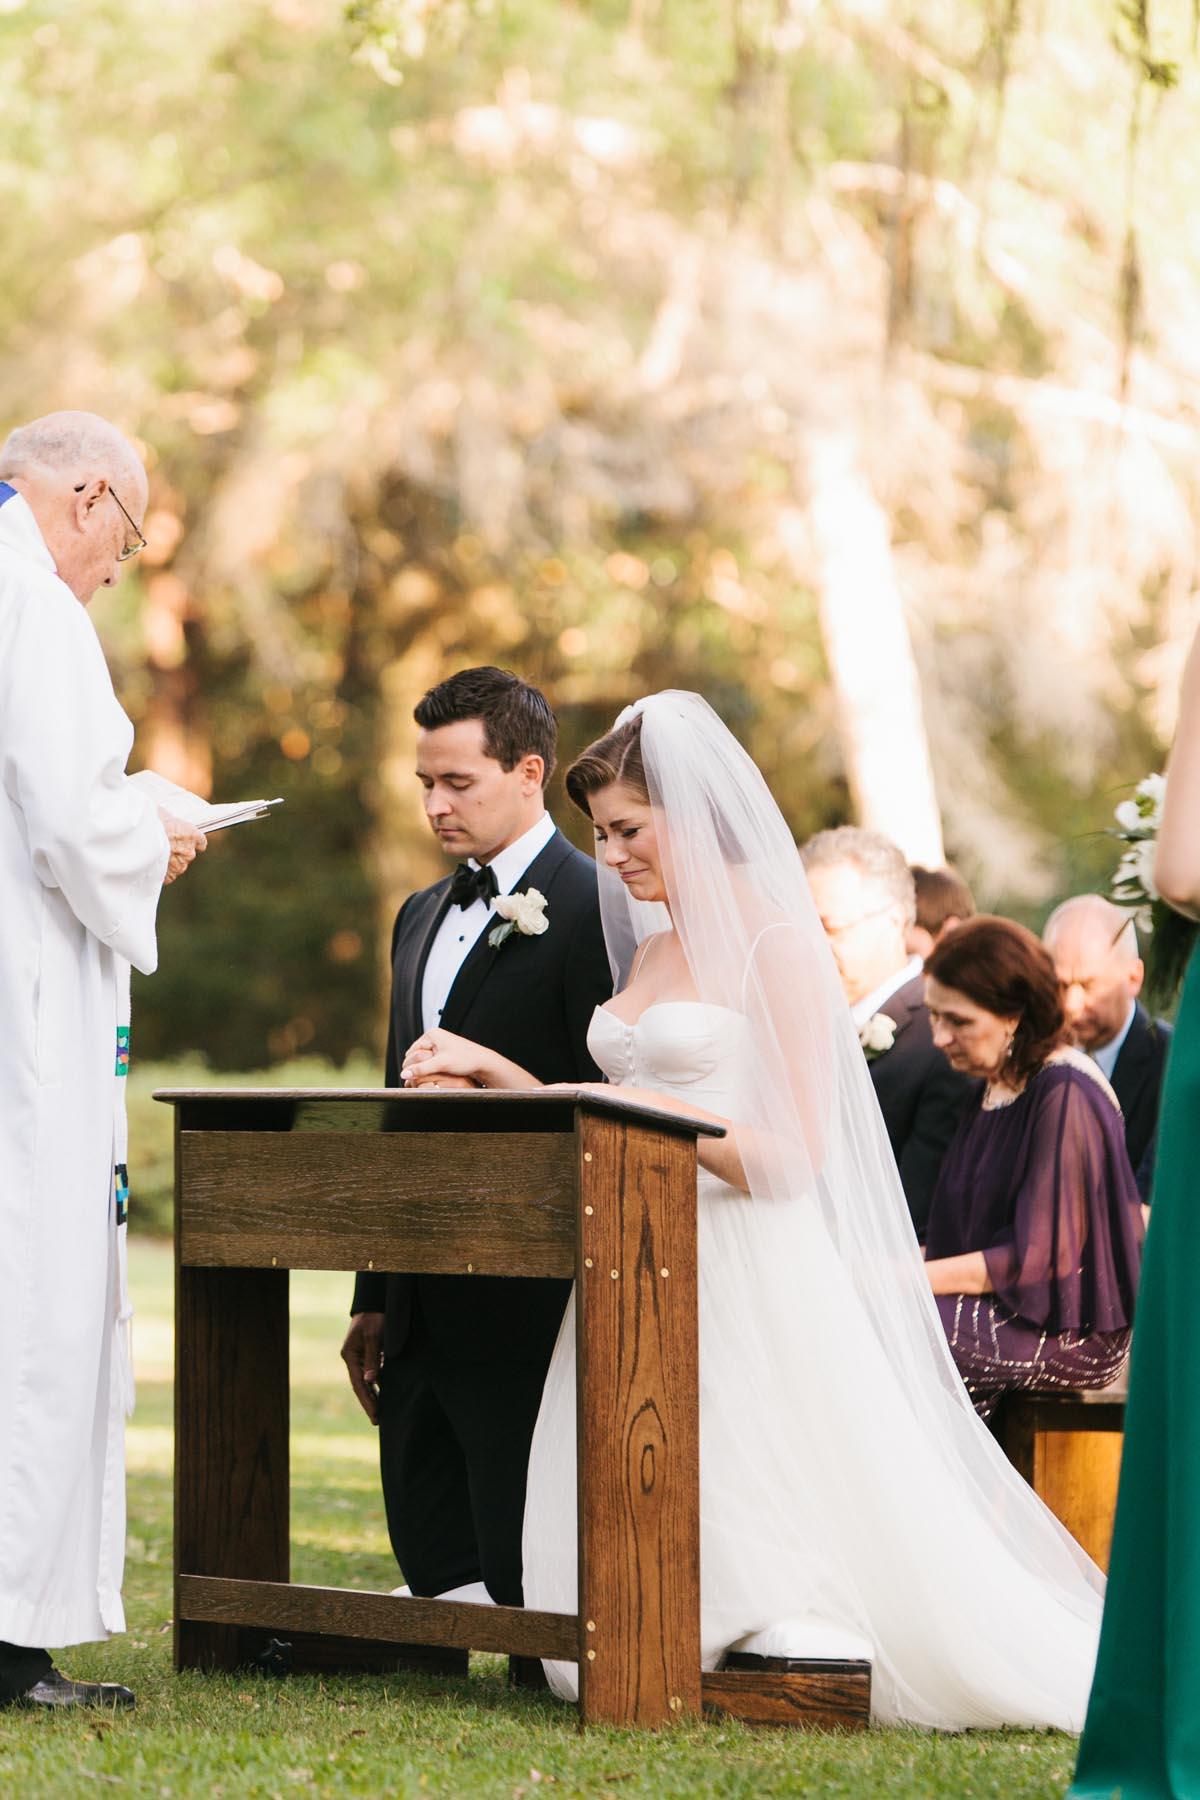 lowry wedding blog eden garden florida wedding-70